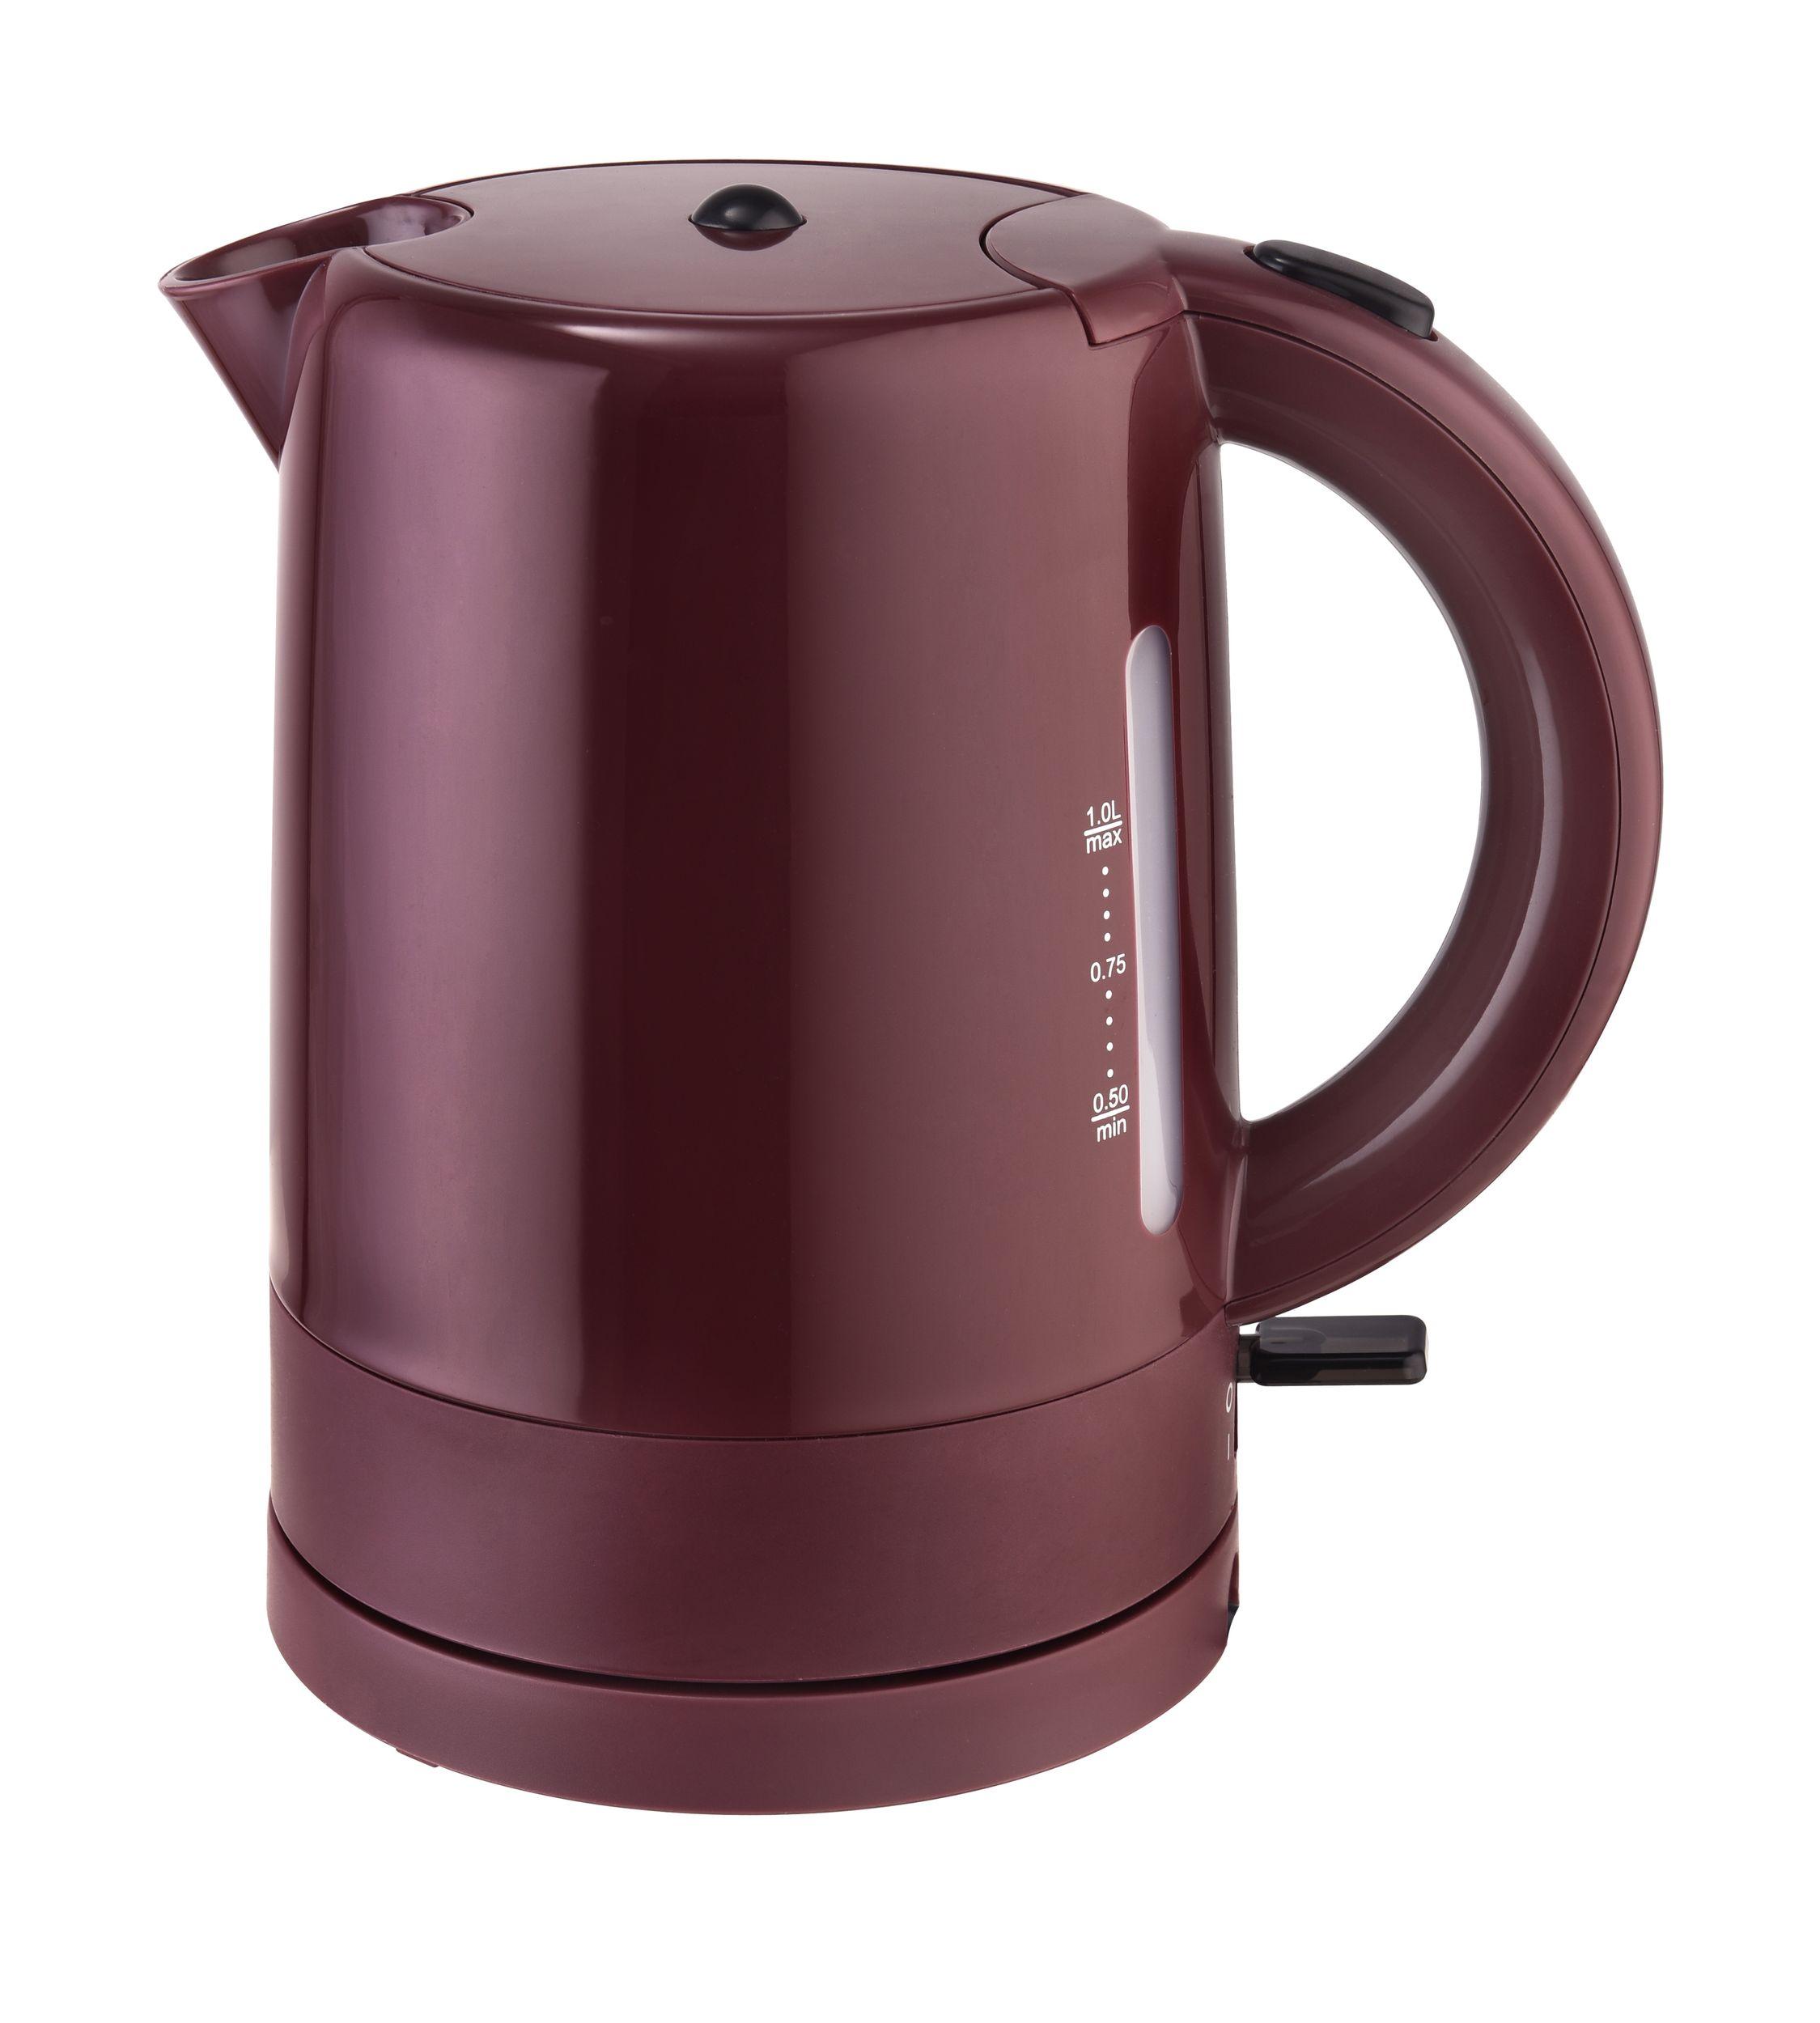 Frühstücksset 3-teilig Toaster Wasserkocher 1 Liter Kaffeemaschine 1,25 Liter Weinrot Bordeaux Bild 2